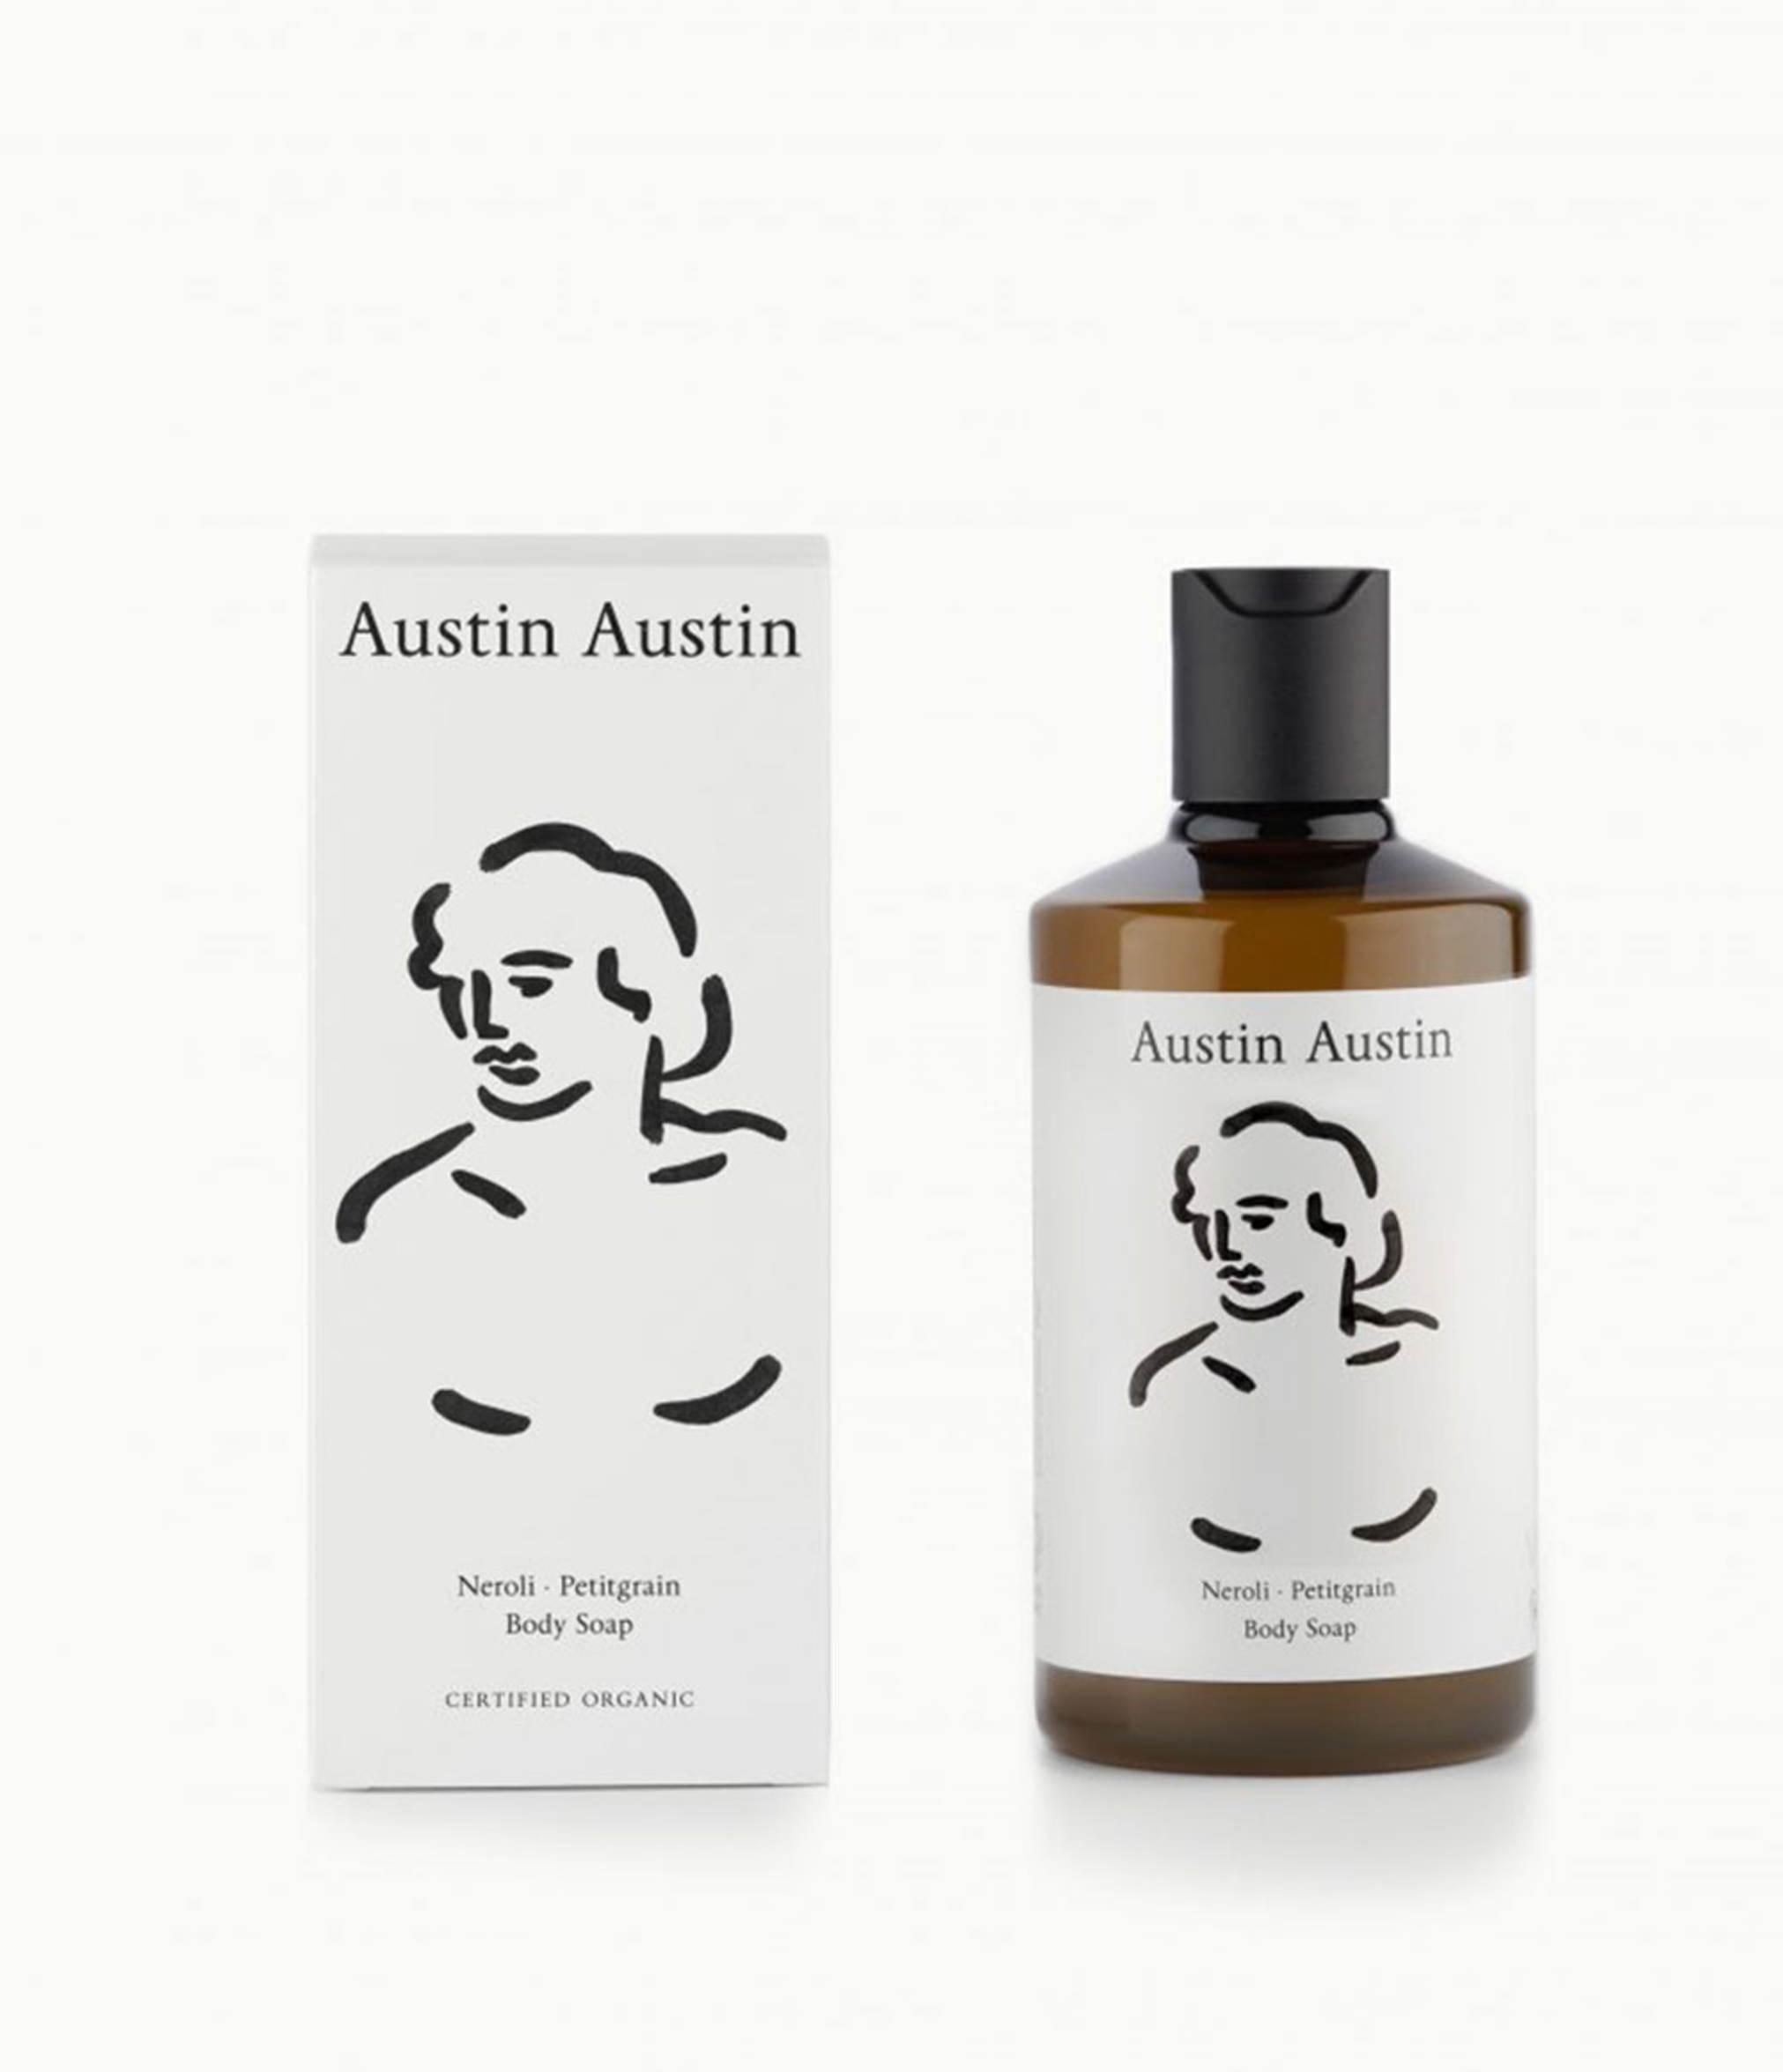 Austin Austin Body Soap